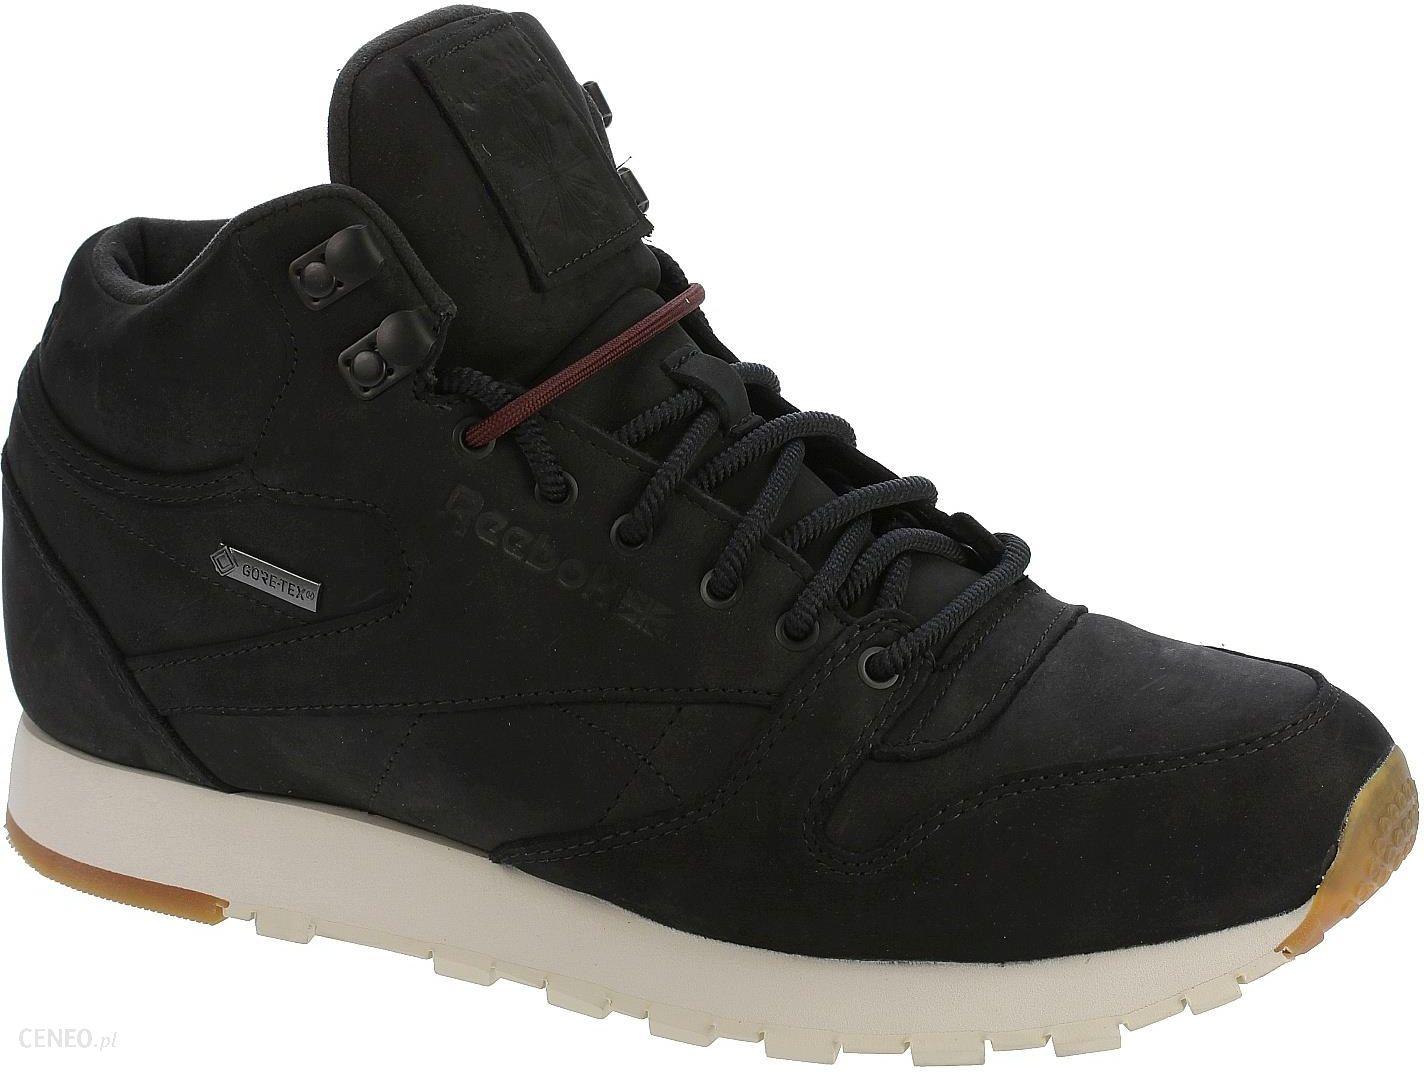 b33bb364 buty Reebok Classic Leather Mid GTX Thin - Black/Paperwhite/Gum 46 - zdjęcie